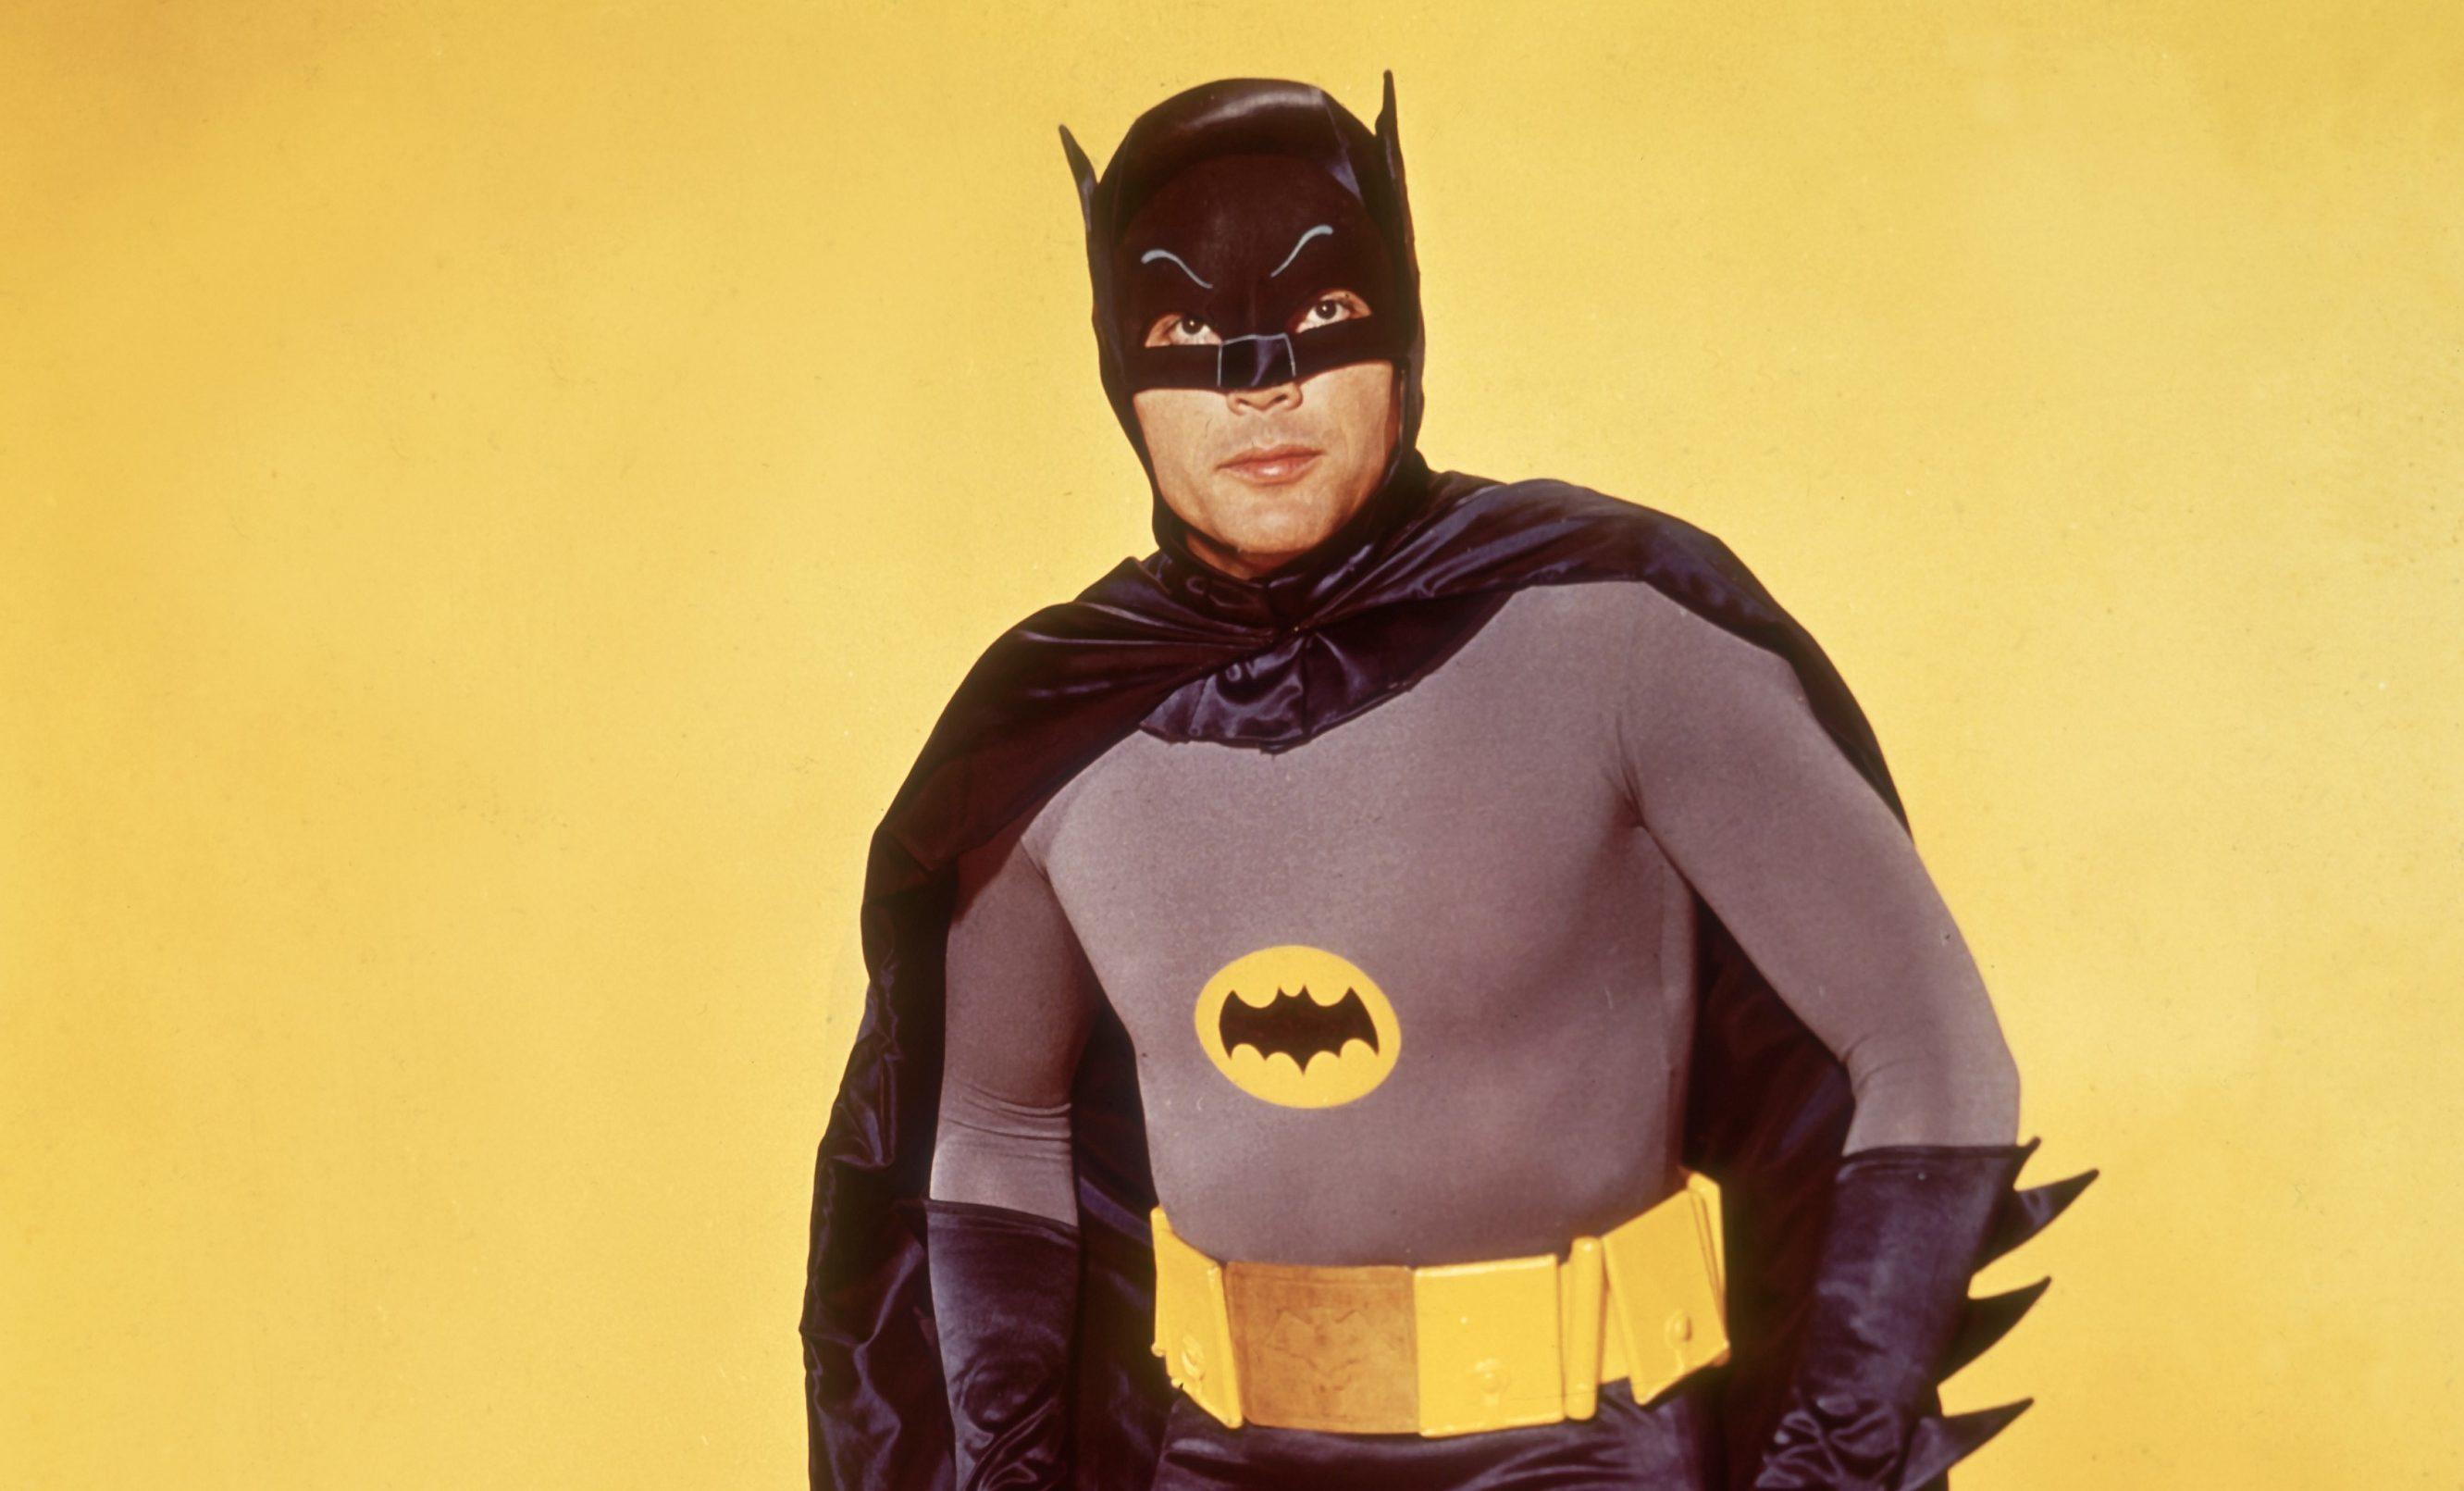 Adam West as Batman for the 1966 movie.